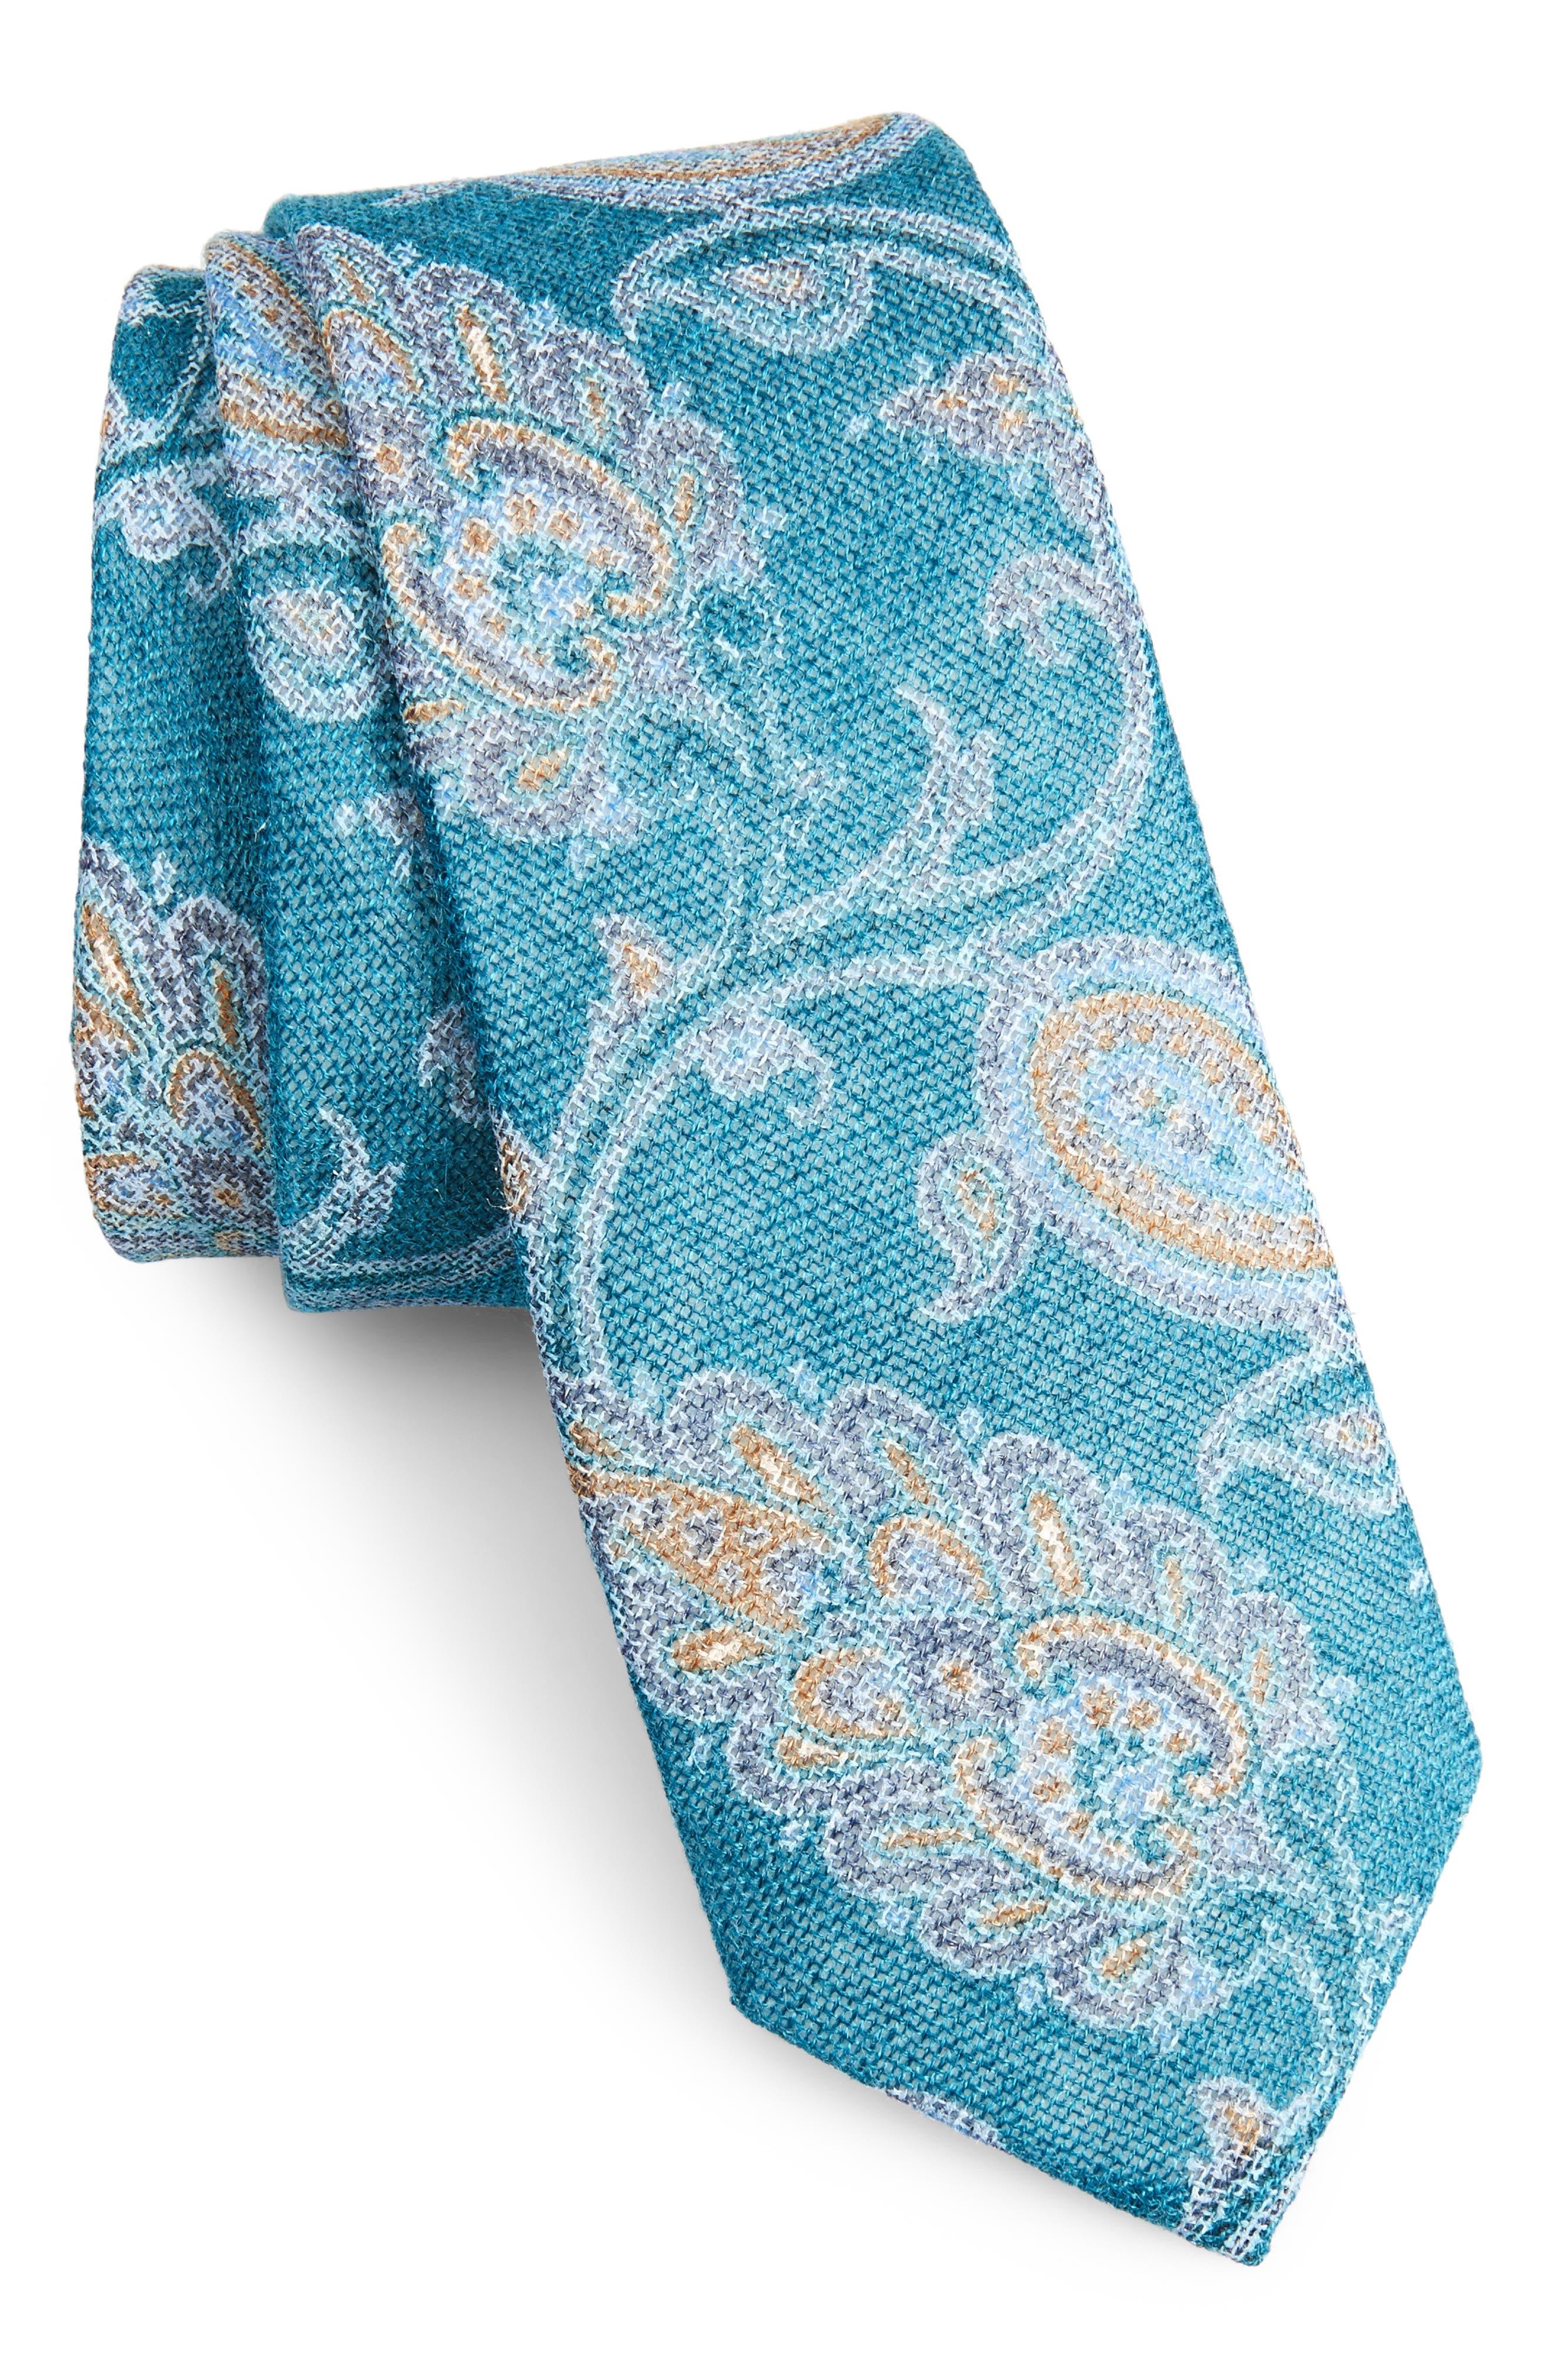 Nordstrom Men's Shop Bradford Paisley Skinny Tie